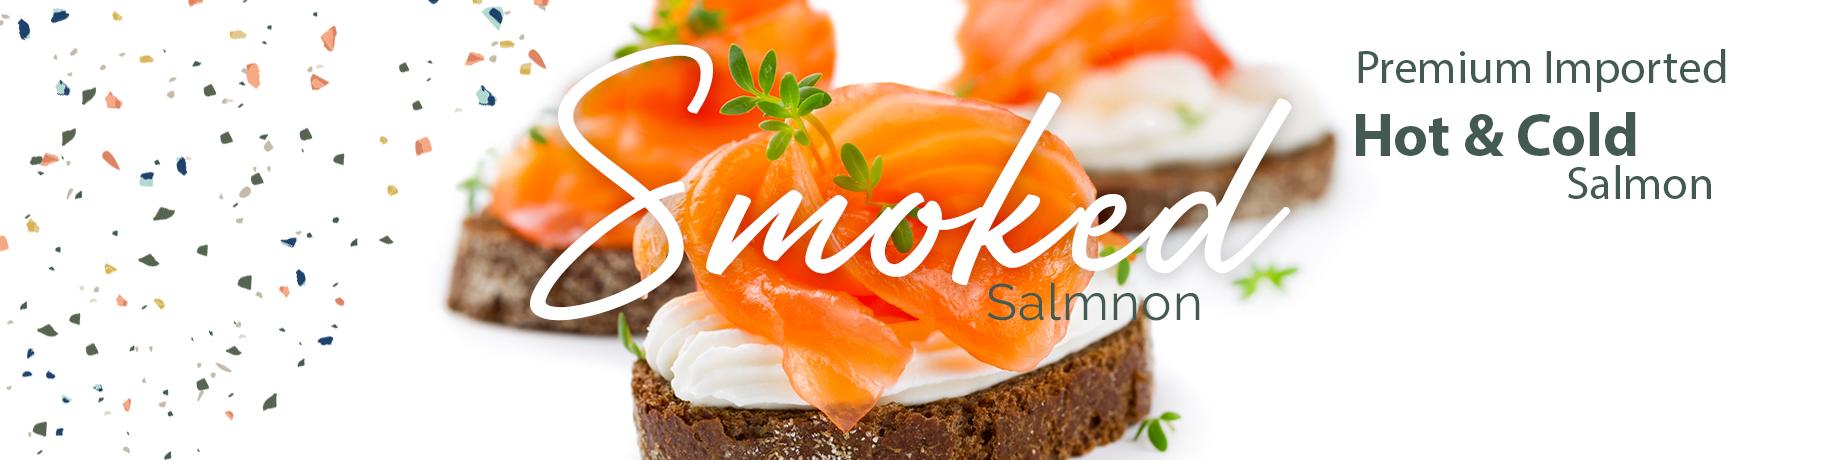 Premium Norwegian Salmon